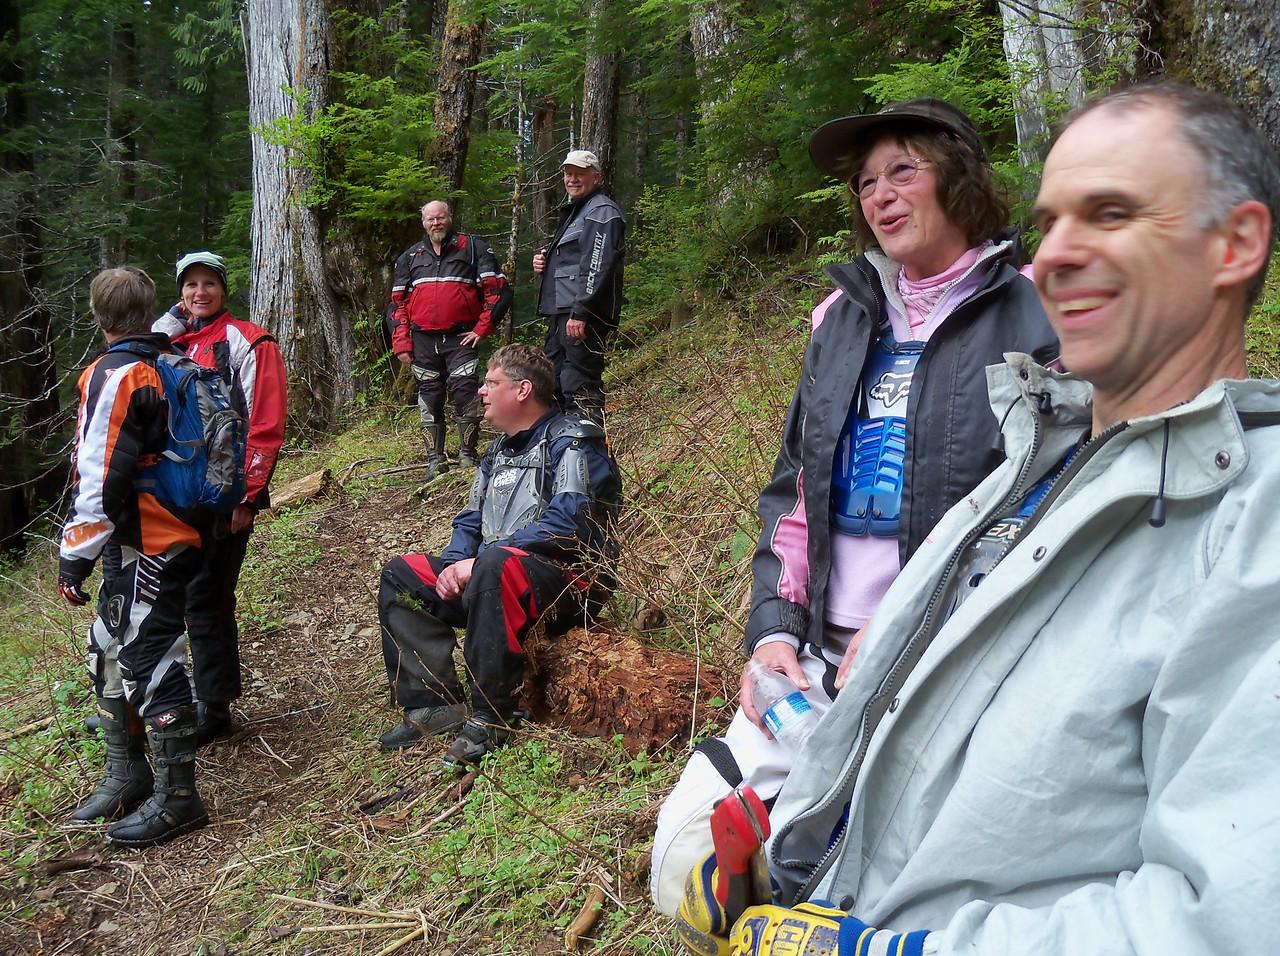 Bob, Dawn,Brian, Anthony on the log, Paul, Sylvia, and Scott...